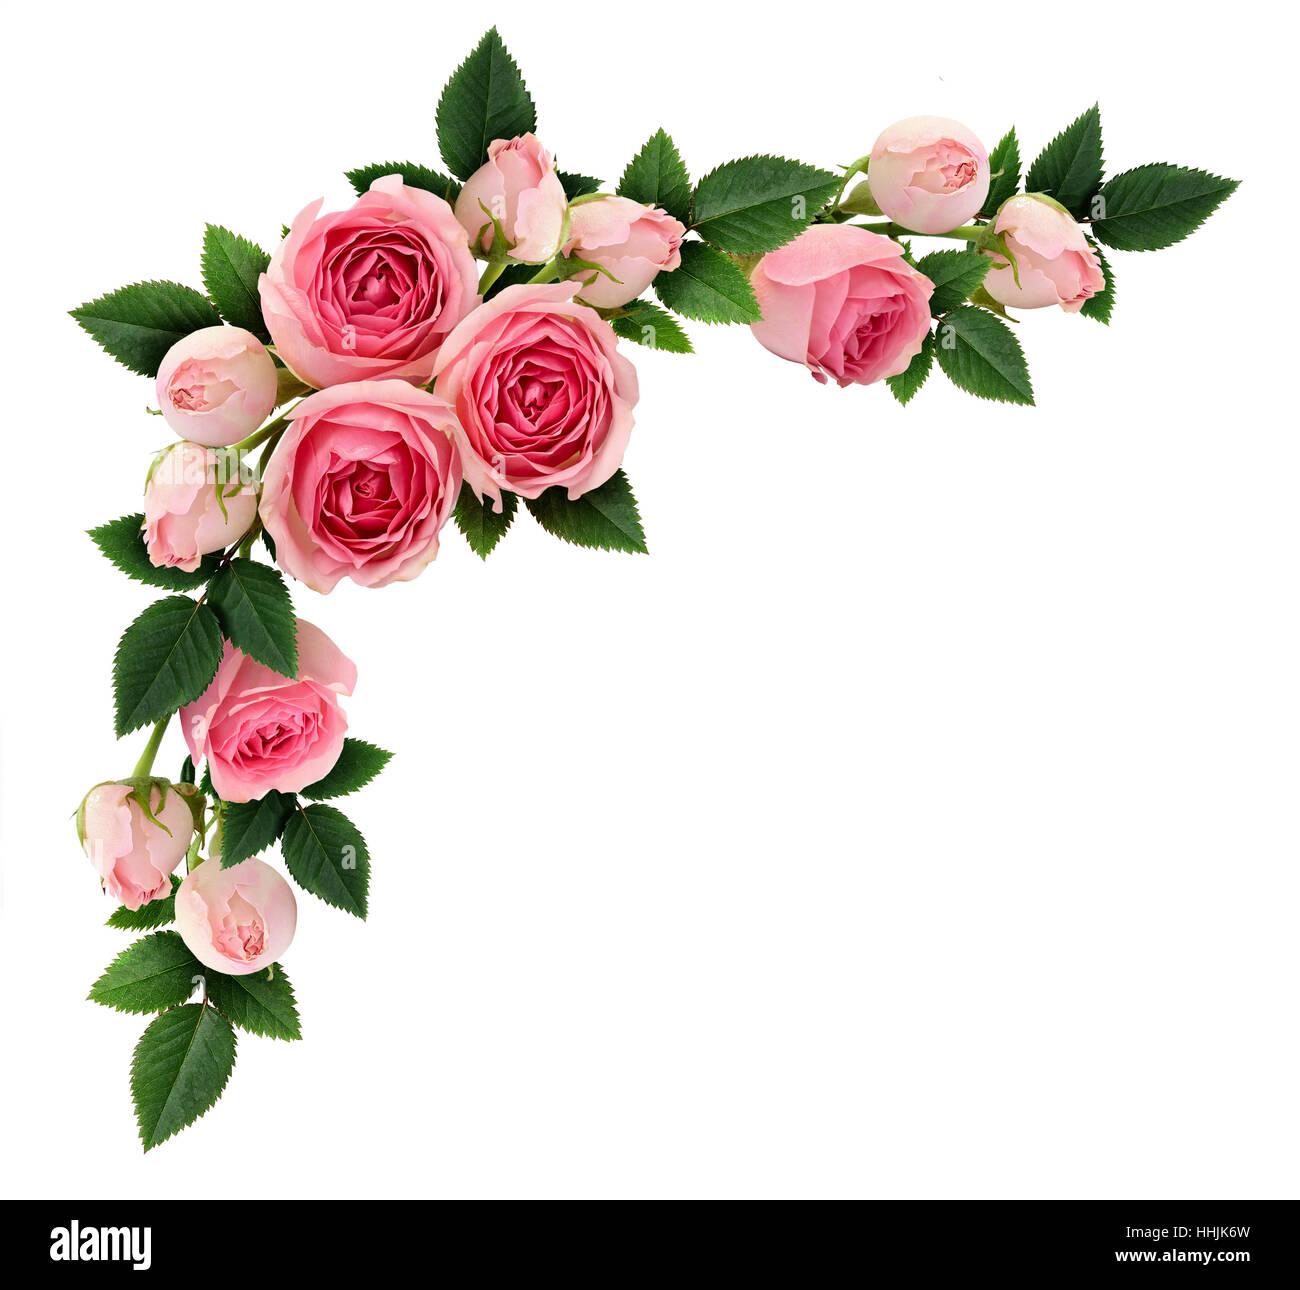 Corner Floral Garden Area: Pink Rose Flowers And Buds Corner Arrangement Isolated On